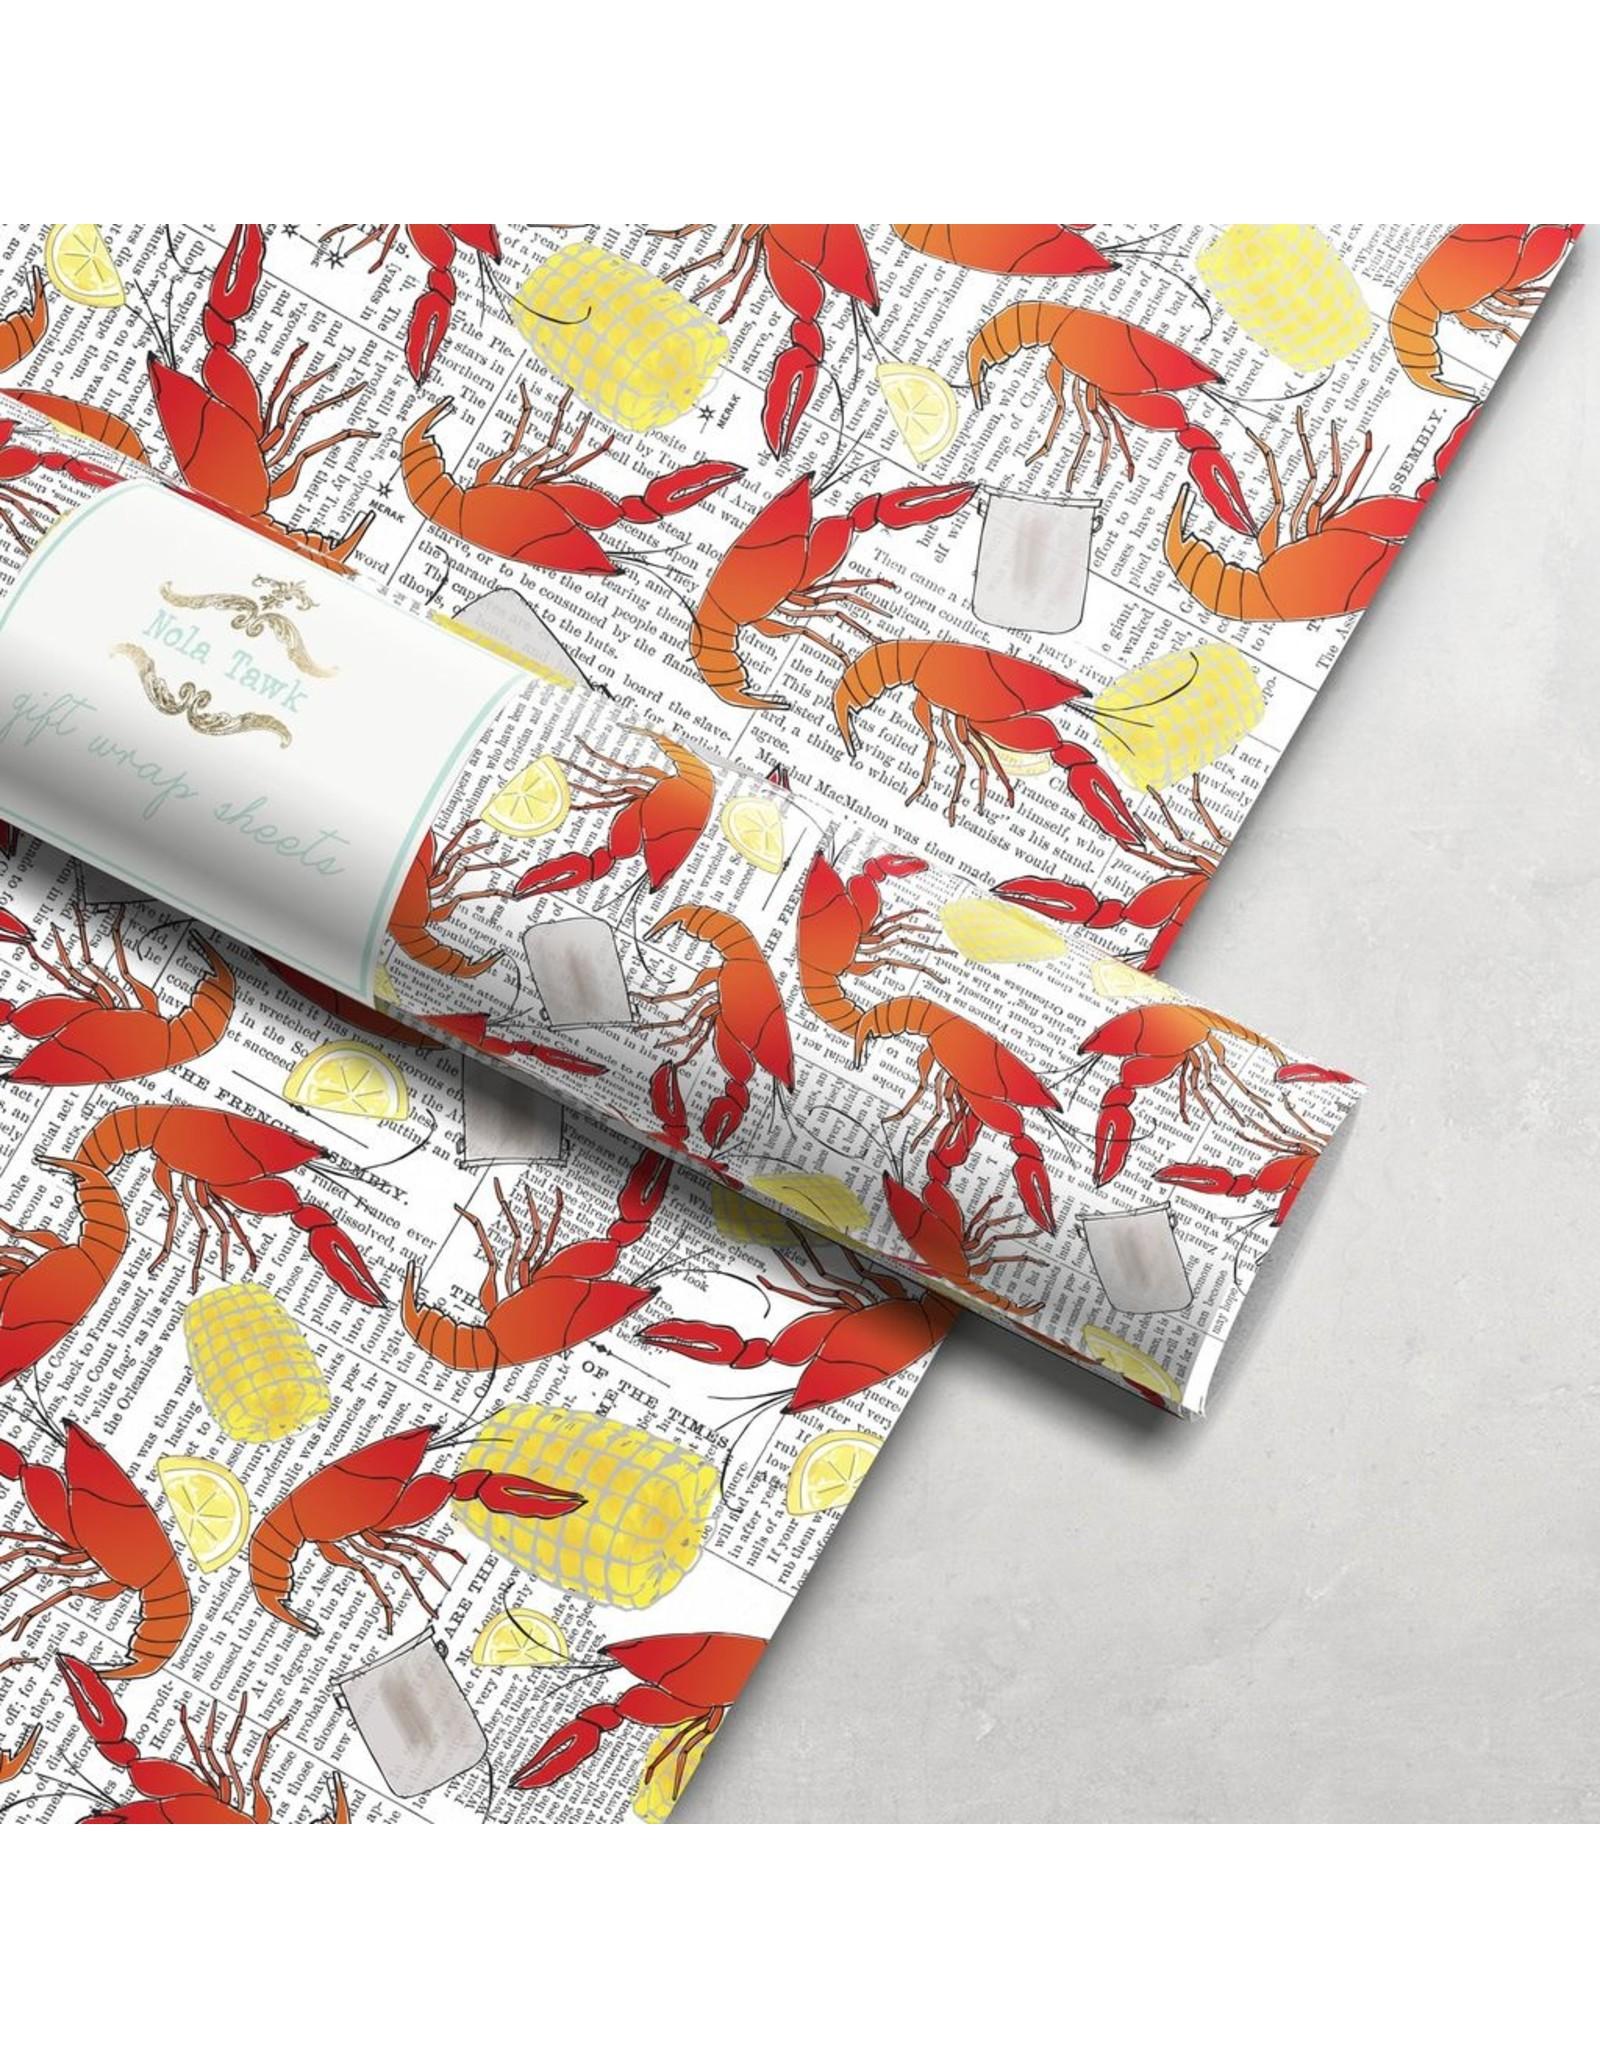 Nola Tawk Crawfish Boil Wrapping Paper